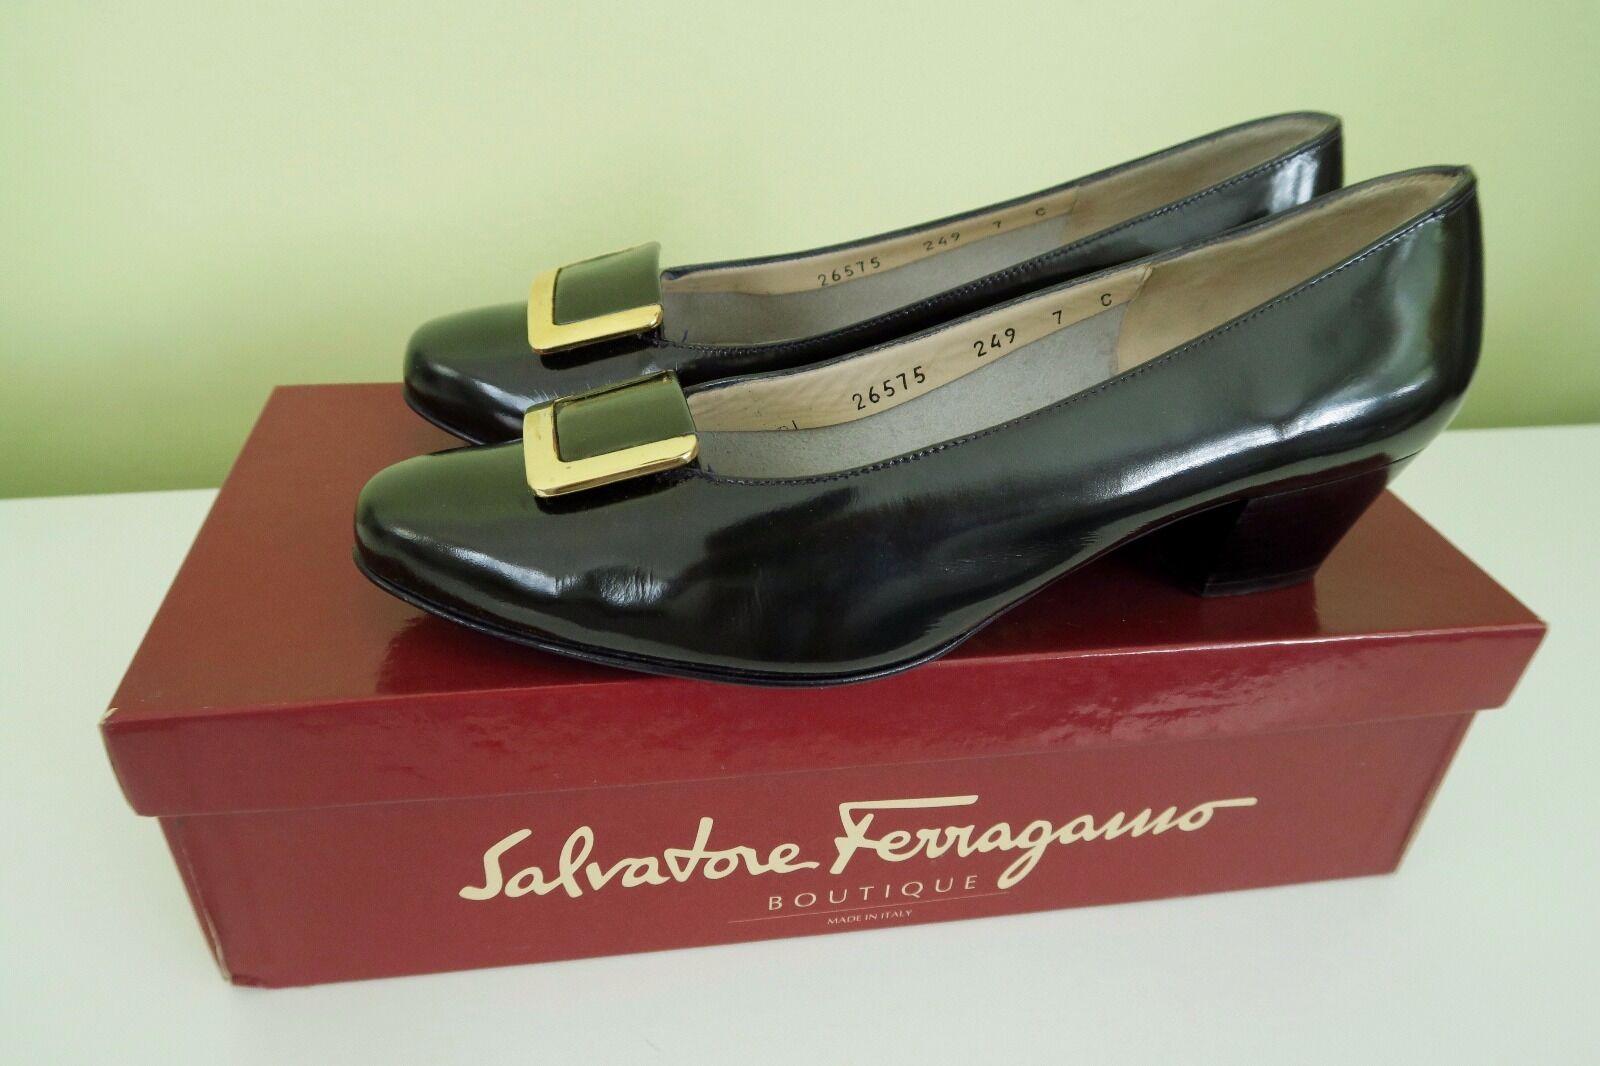 Salvatore Ferragamo Black Patent Leather gold Buckle Classic Pumps Low Heels 7